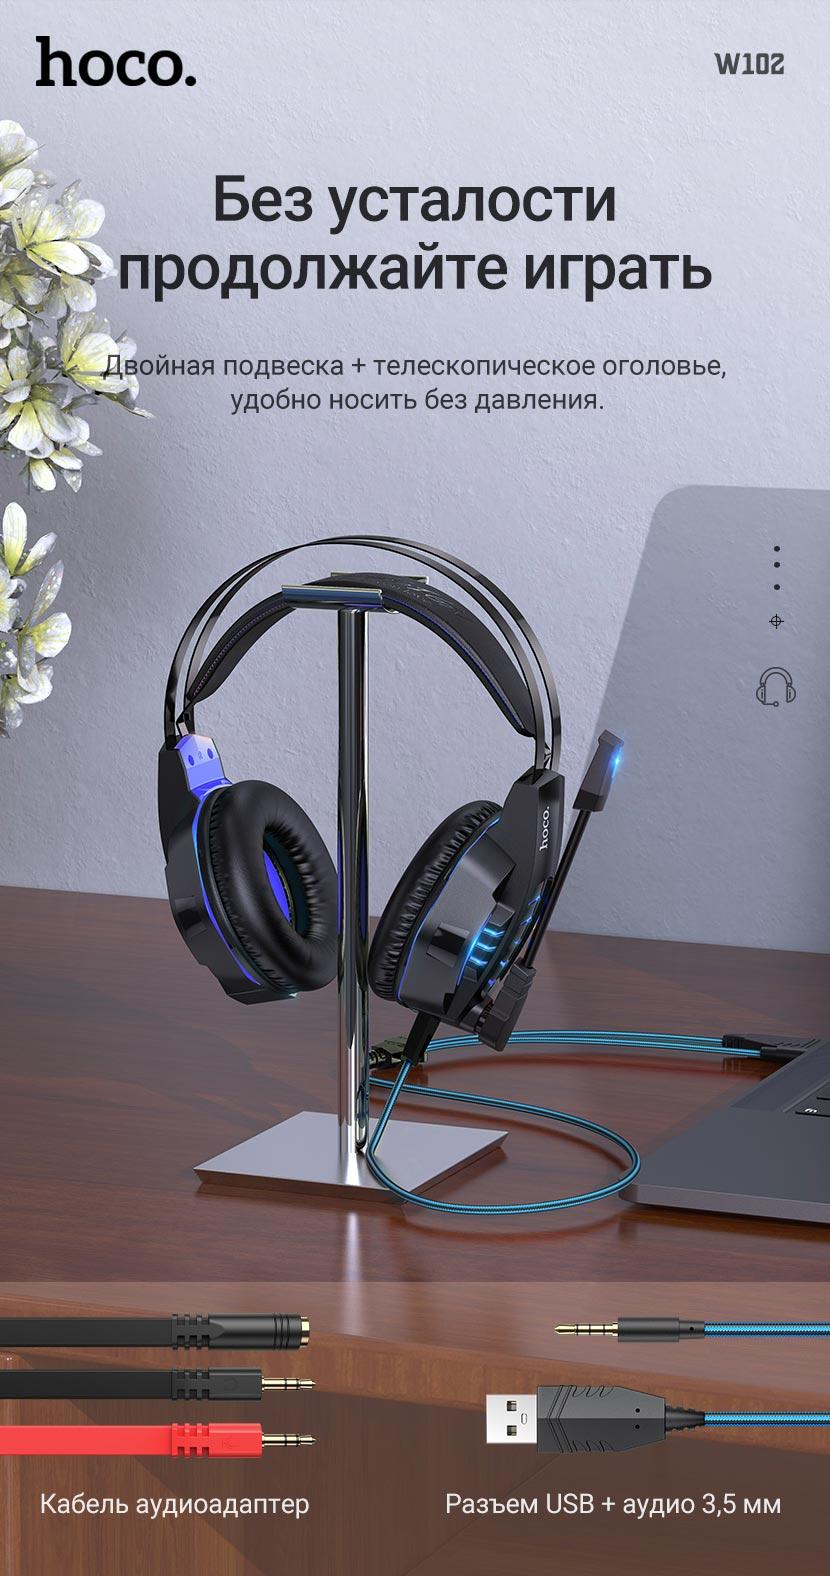 hoco news w102 cool tour gaming headphones comfortable ru